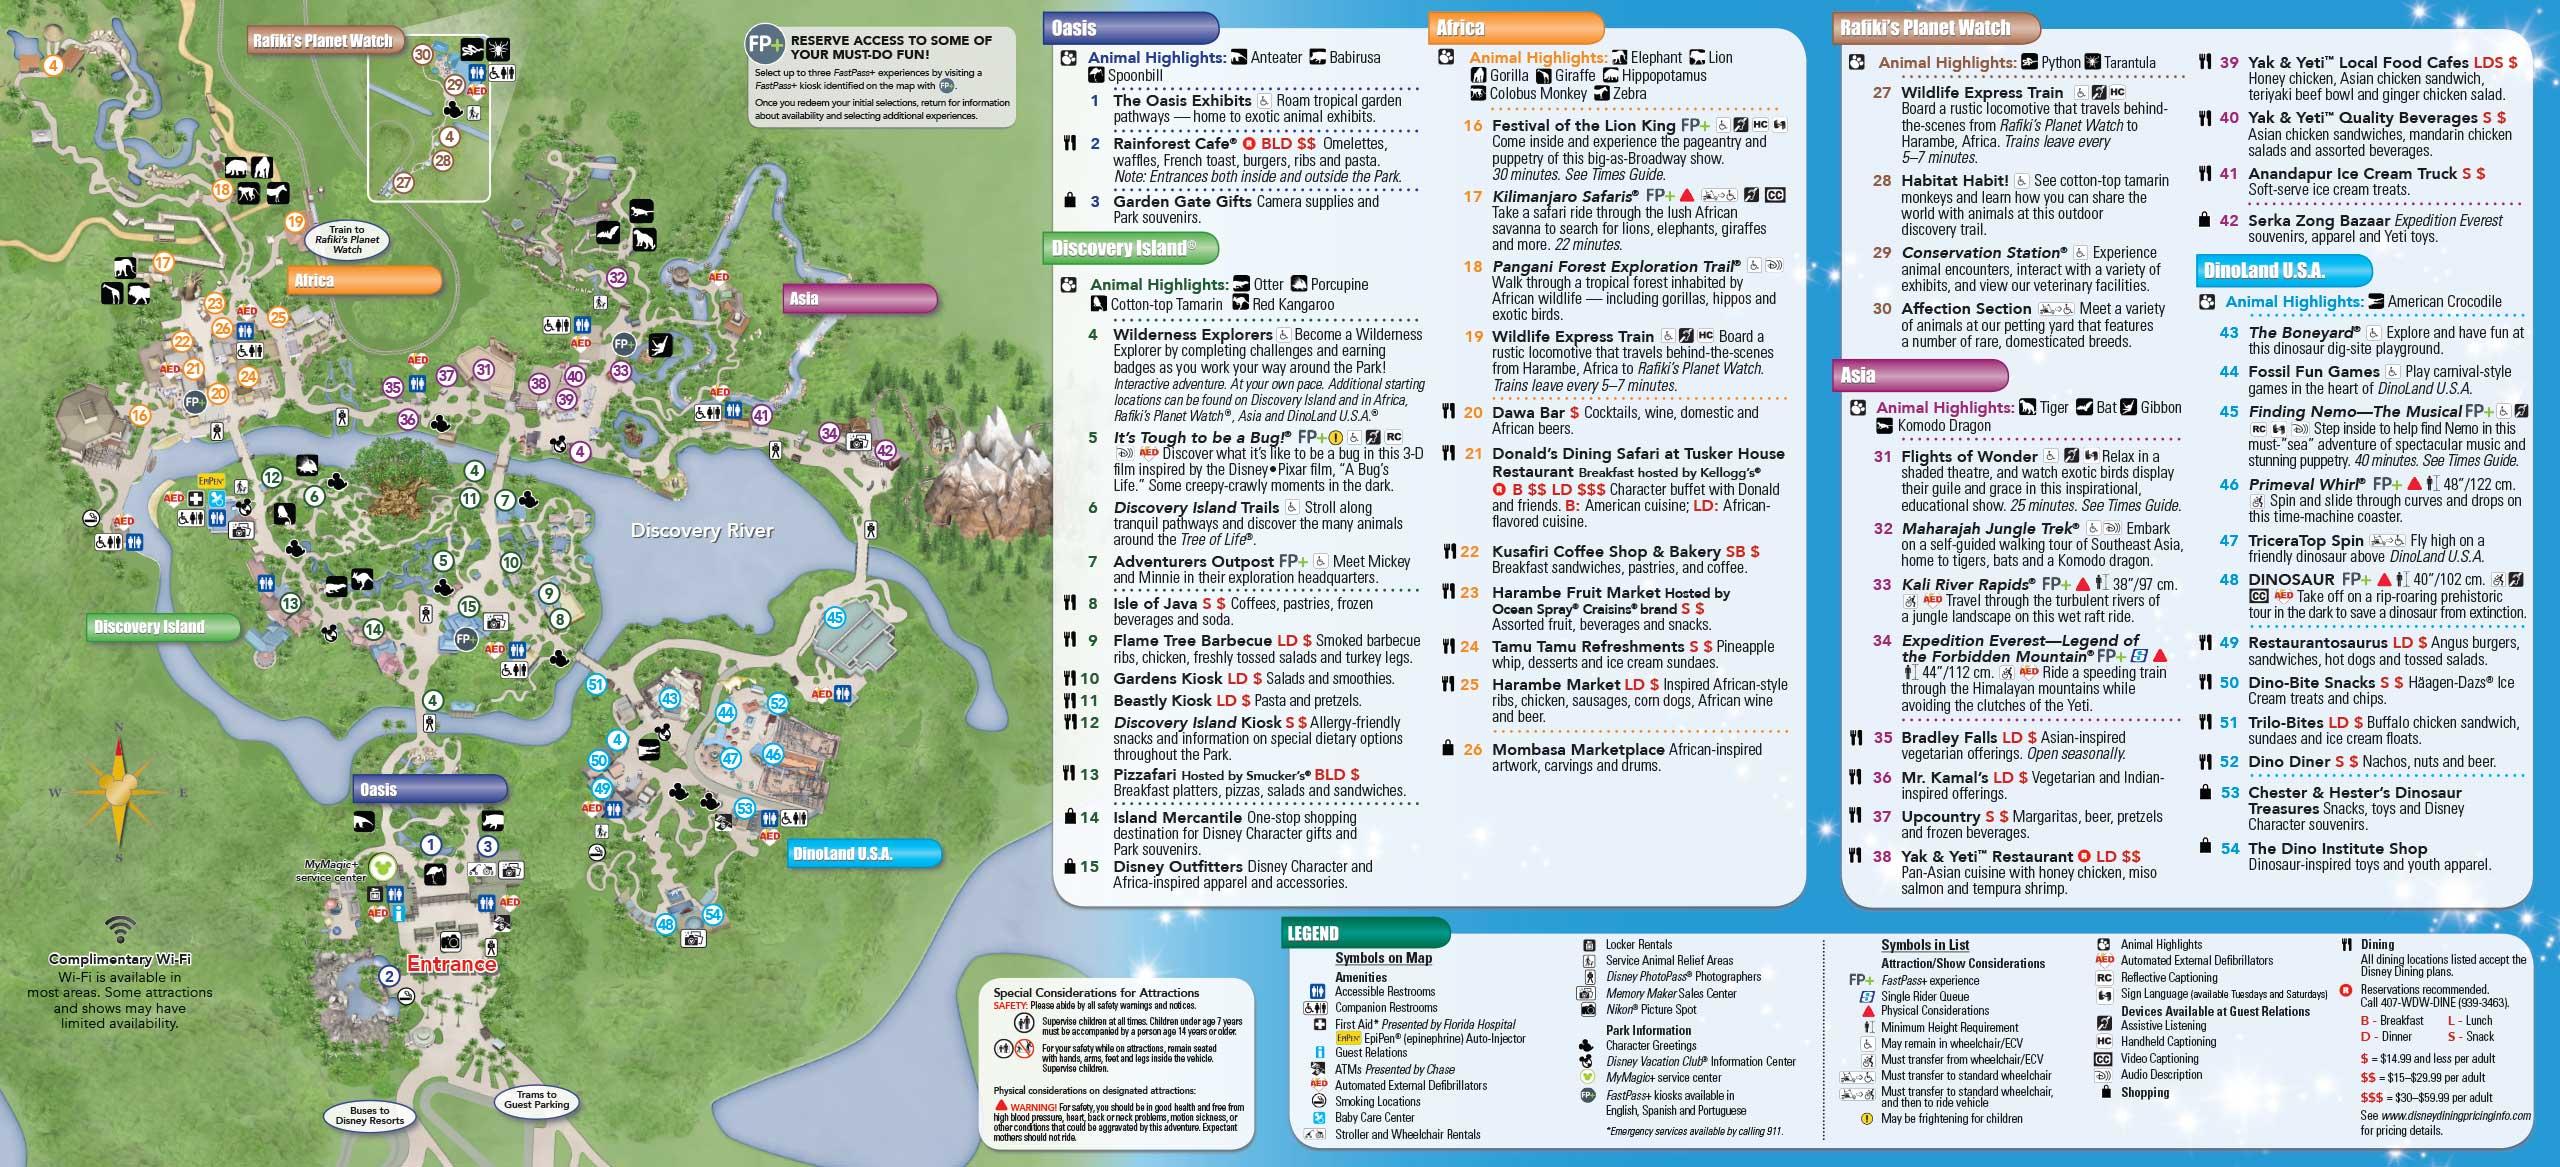 May 2015 Walt Disney World Resort Park Maps - Photo 8 of 14